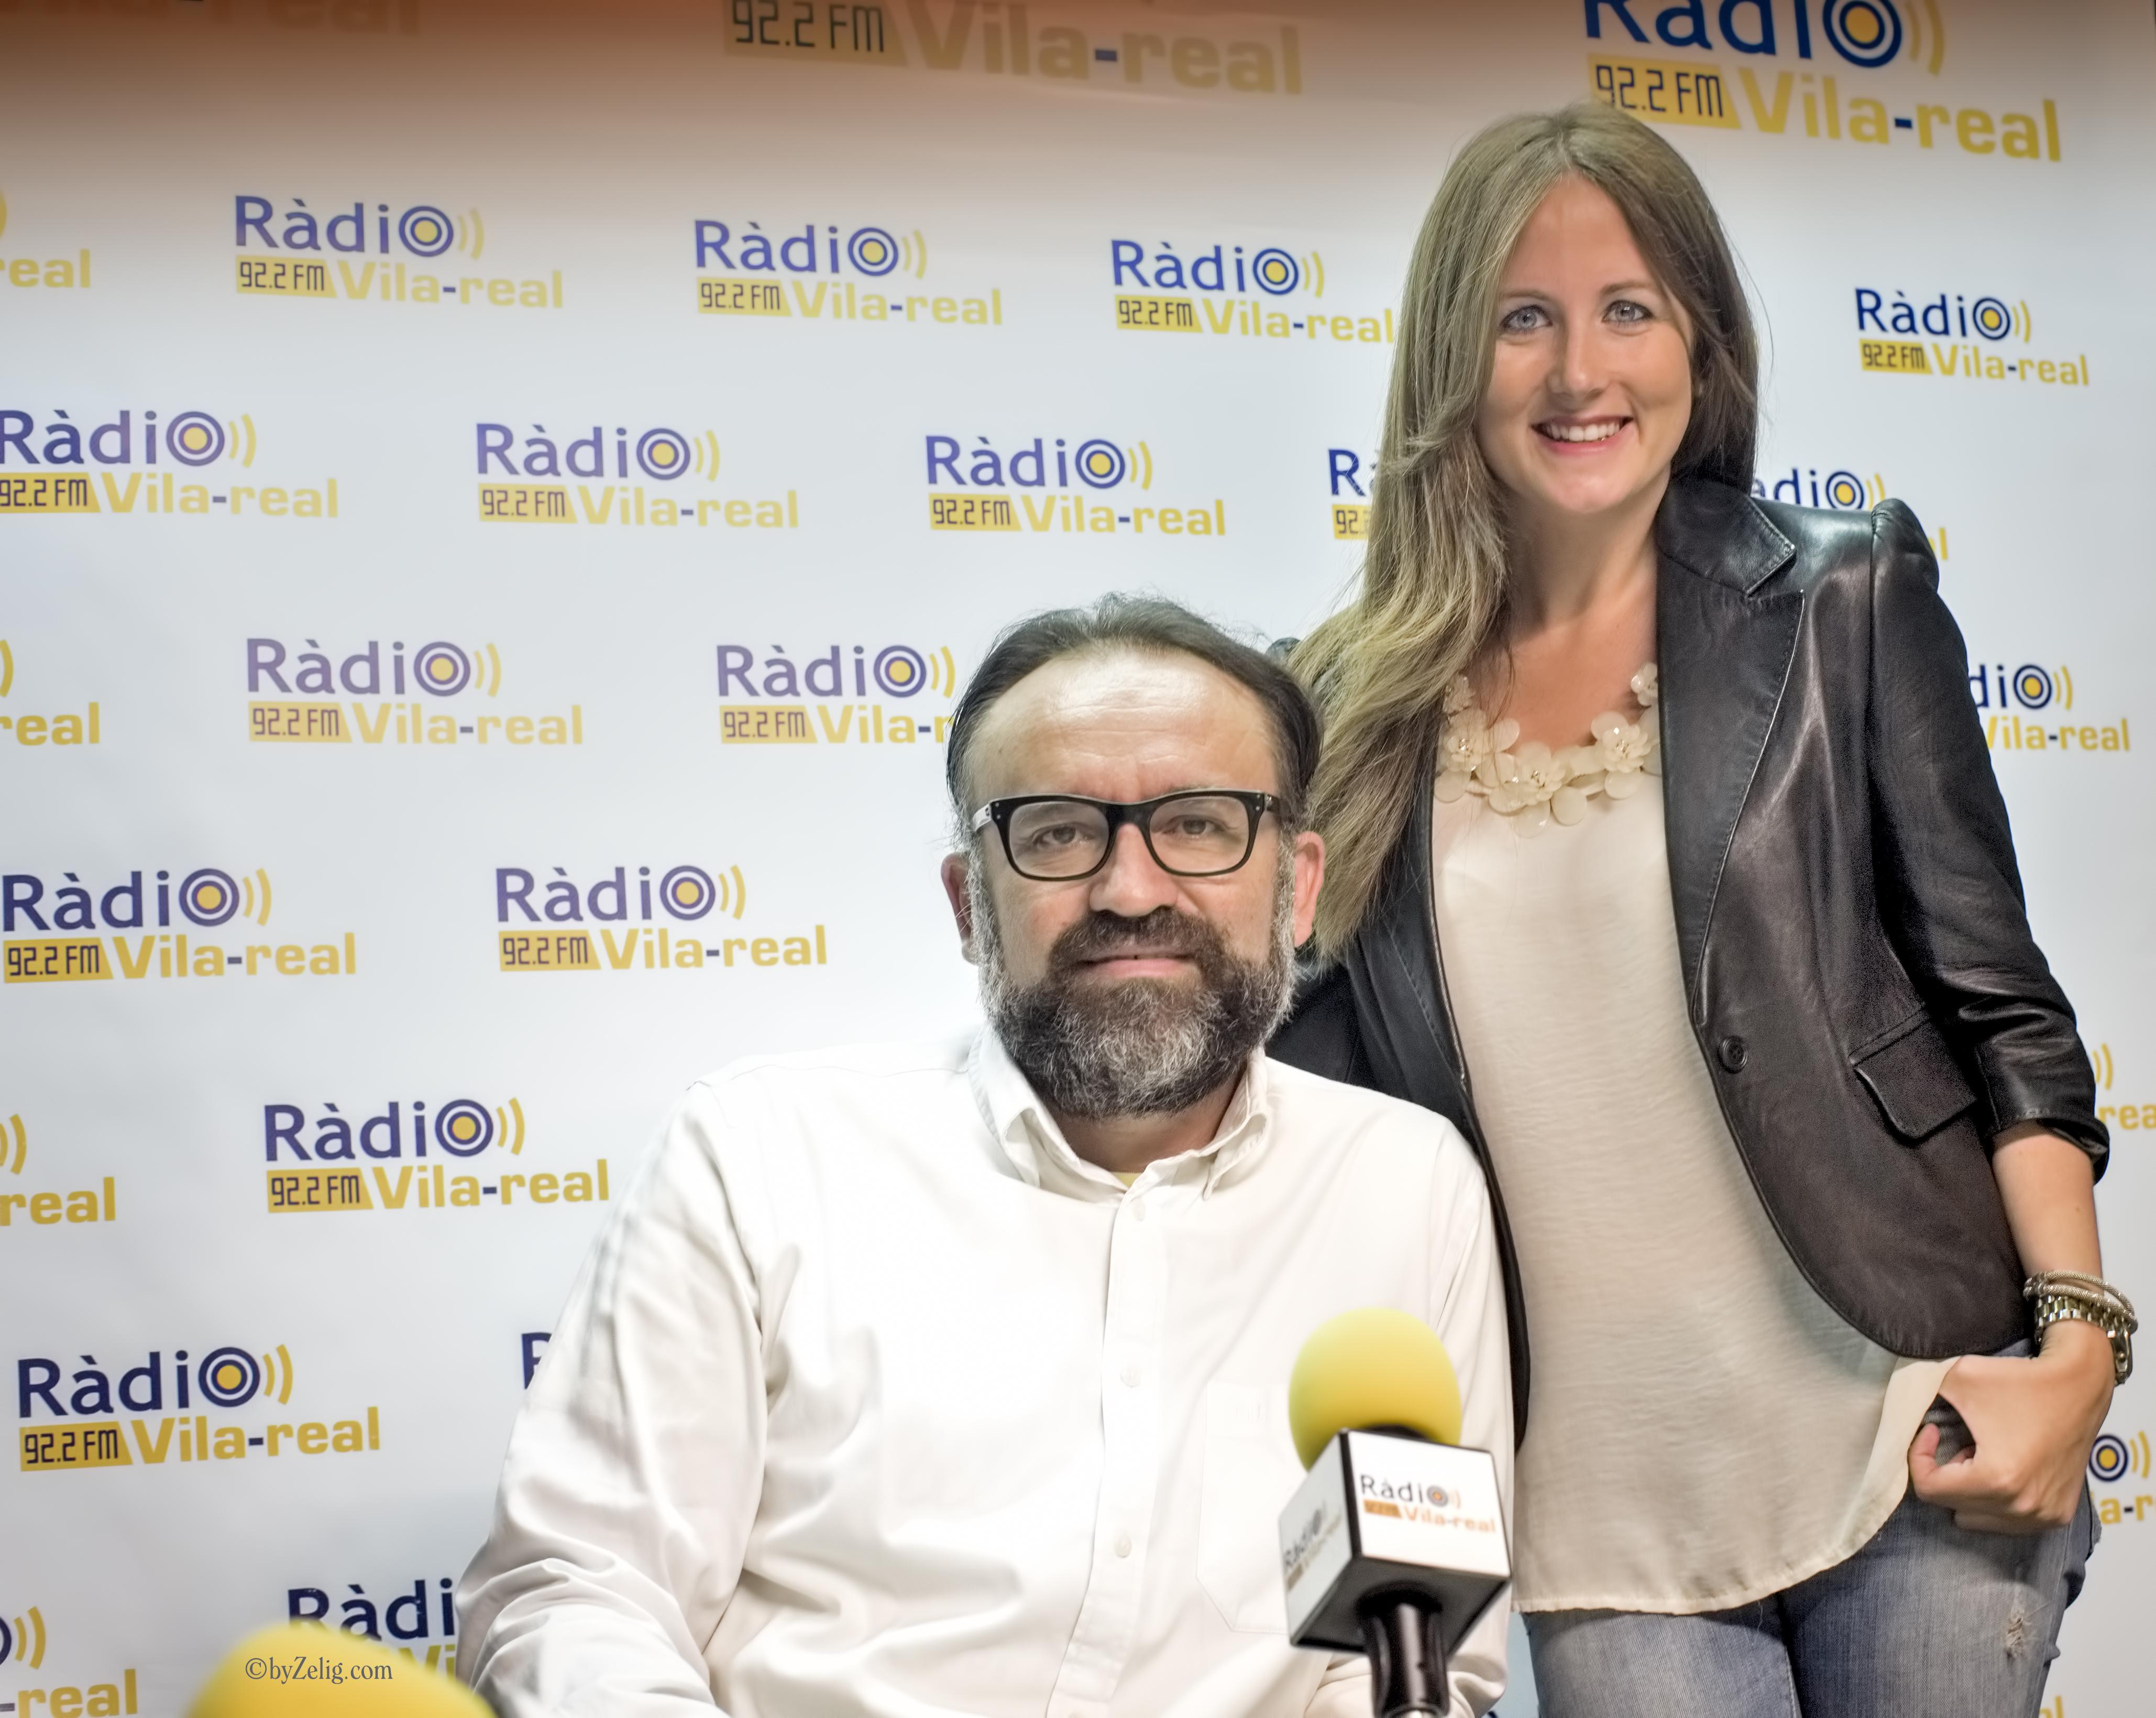 Esports Radio Vila-real. Programa del 23 de octubre 2017